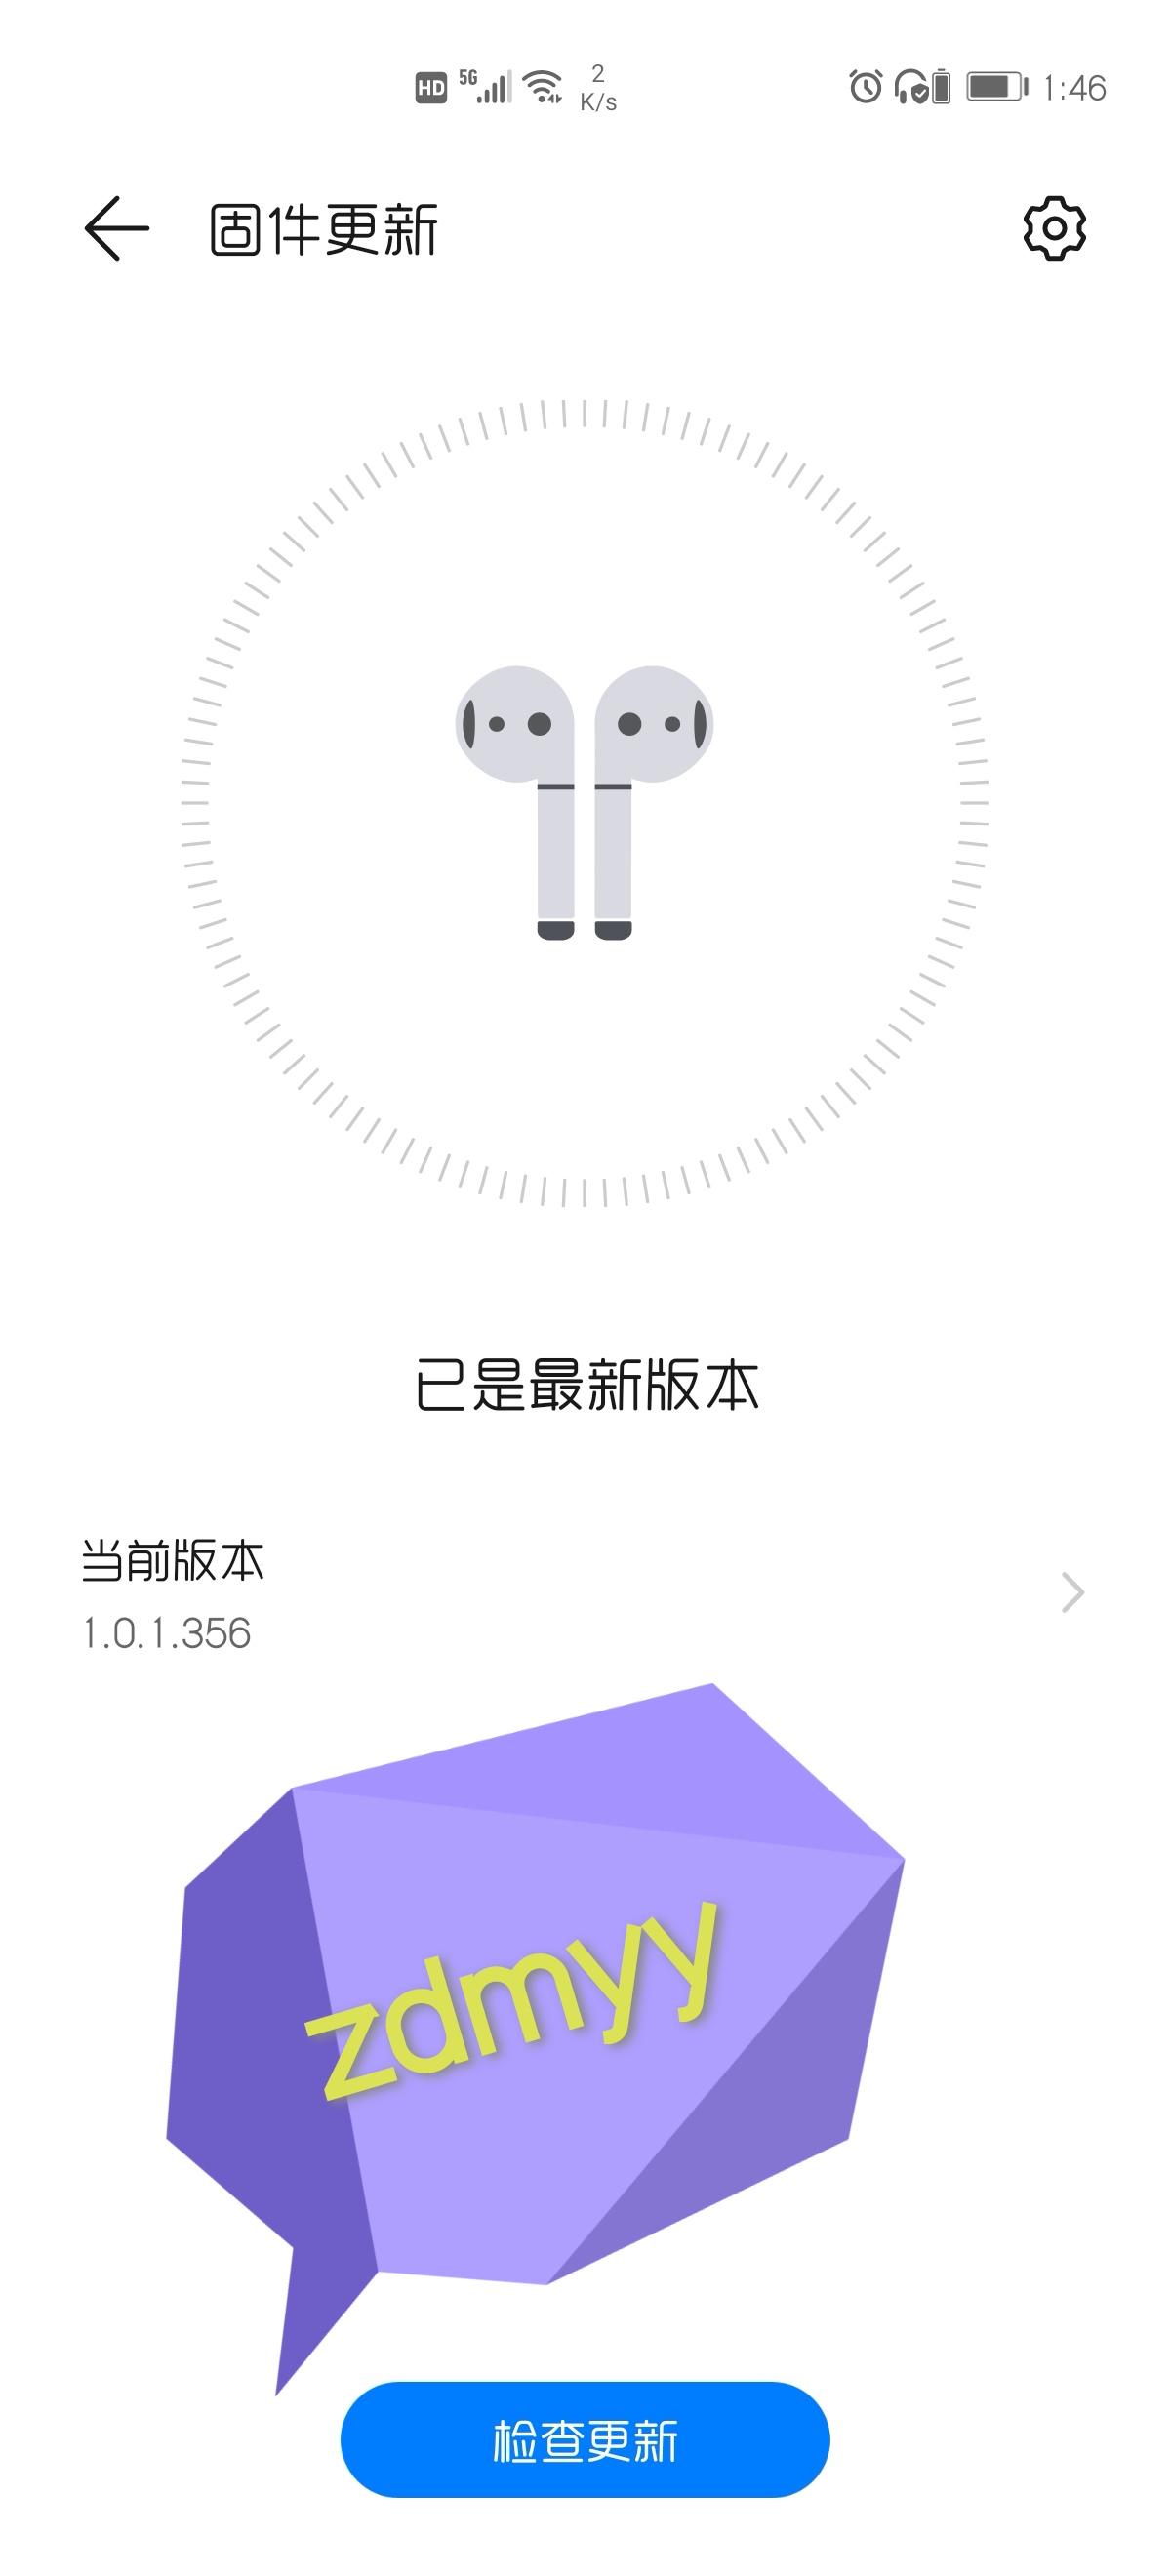 Screenshot_20210329_134650_com.huawei.android.hwouc_edit_87885176478776.jpg